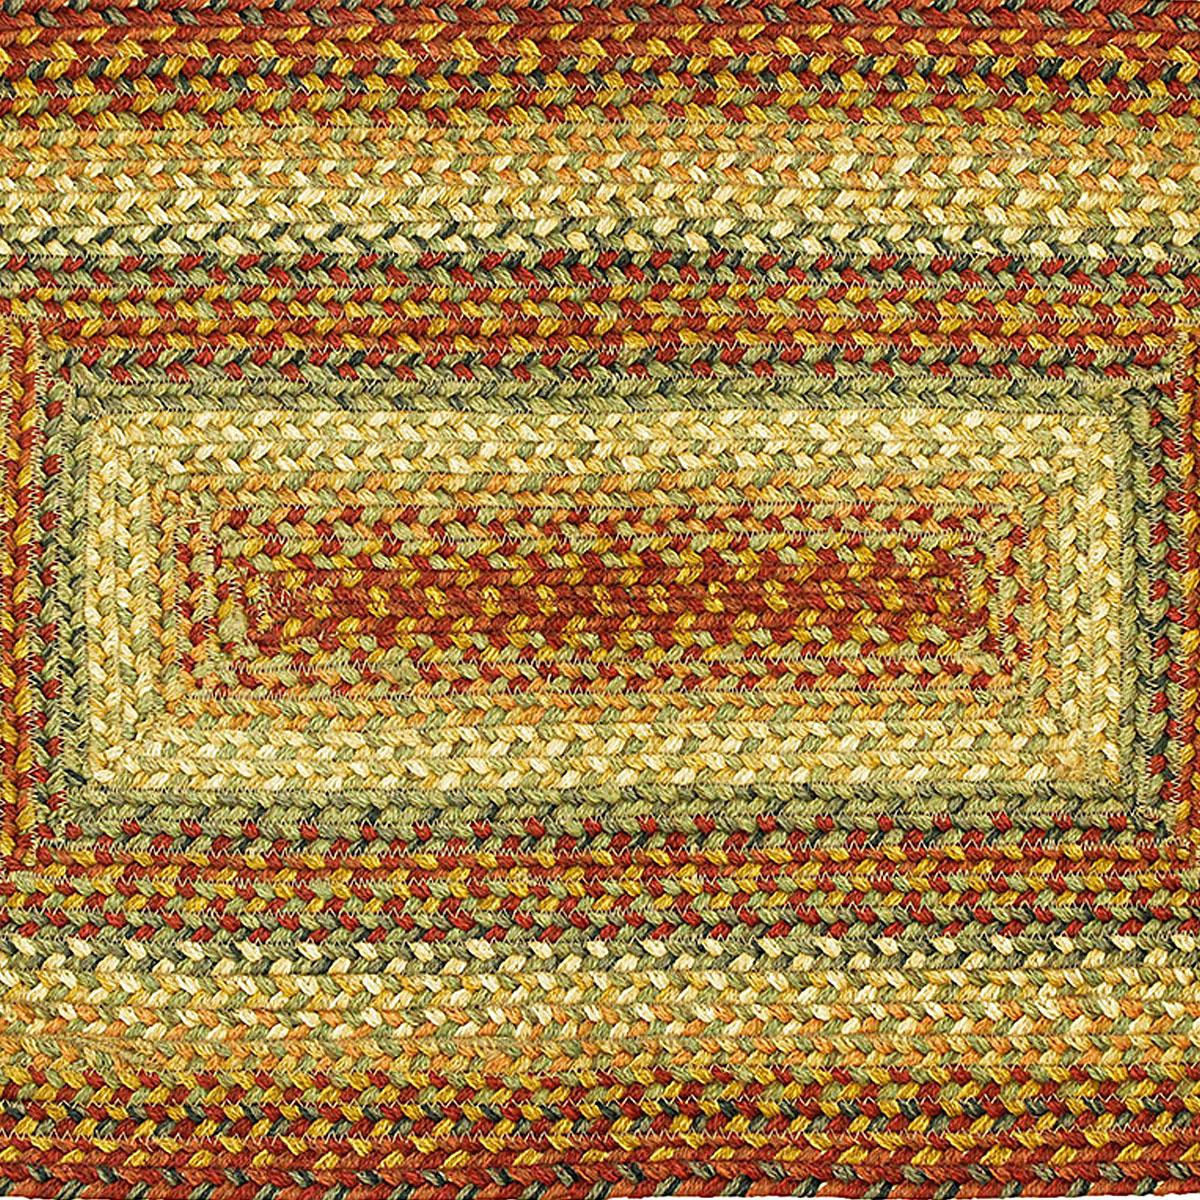 primitive jute braided area rugs oval rectangle 20x30 8x10 graceland ebay. Black Bedroom Furniture Sets. Home Design Ideas